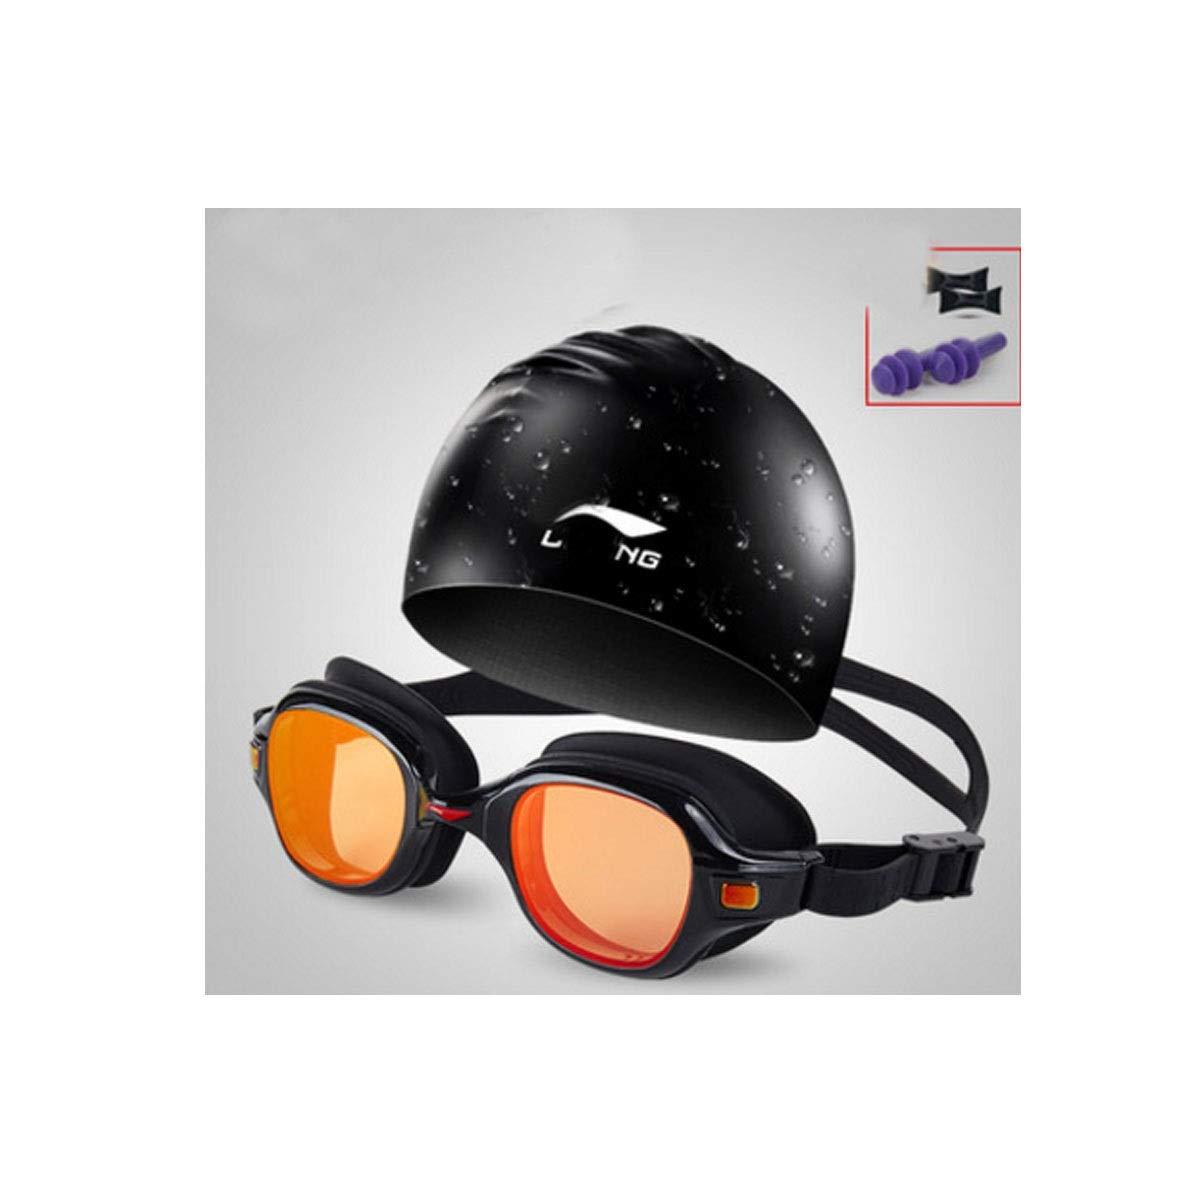 Black 8 Qiyuezhuangshi Goggles, Dreamy pink Red Design Goggles, HD Waterproof and AntiFog Design, Large Box Swimming Equipment,Black Carrying Swimming Cap